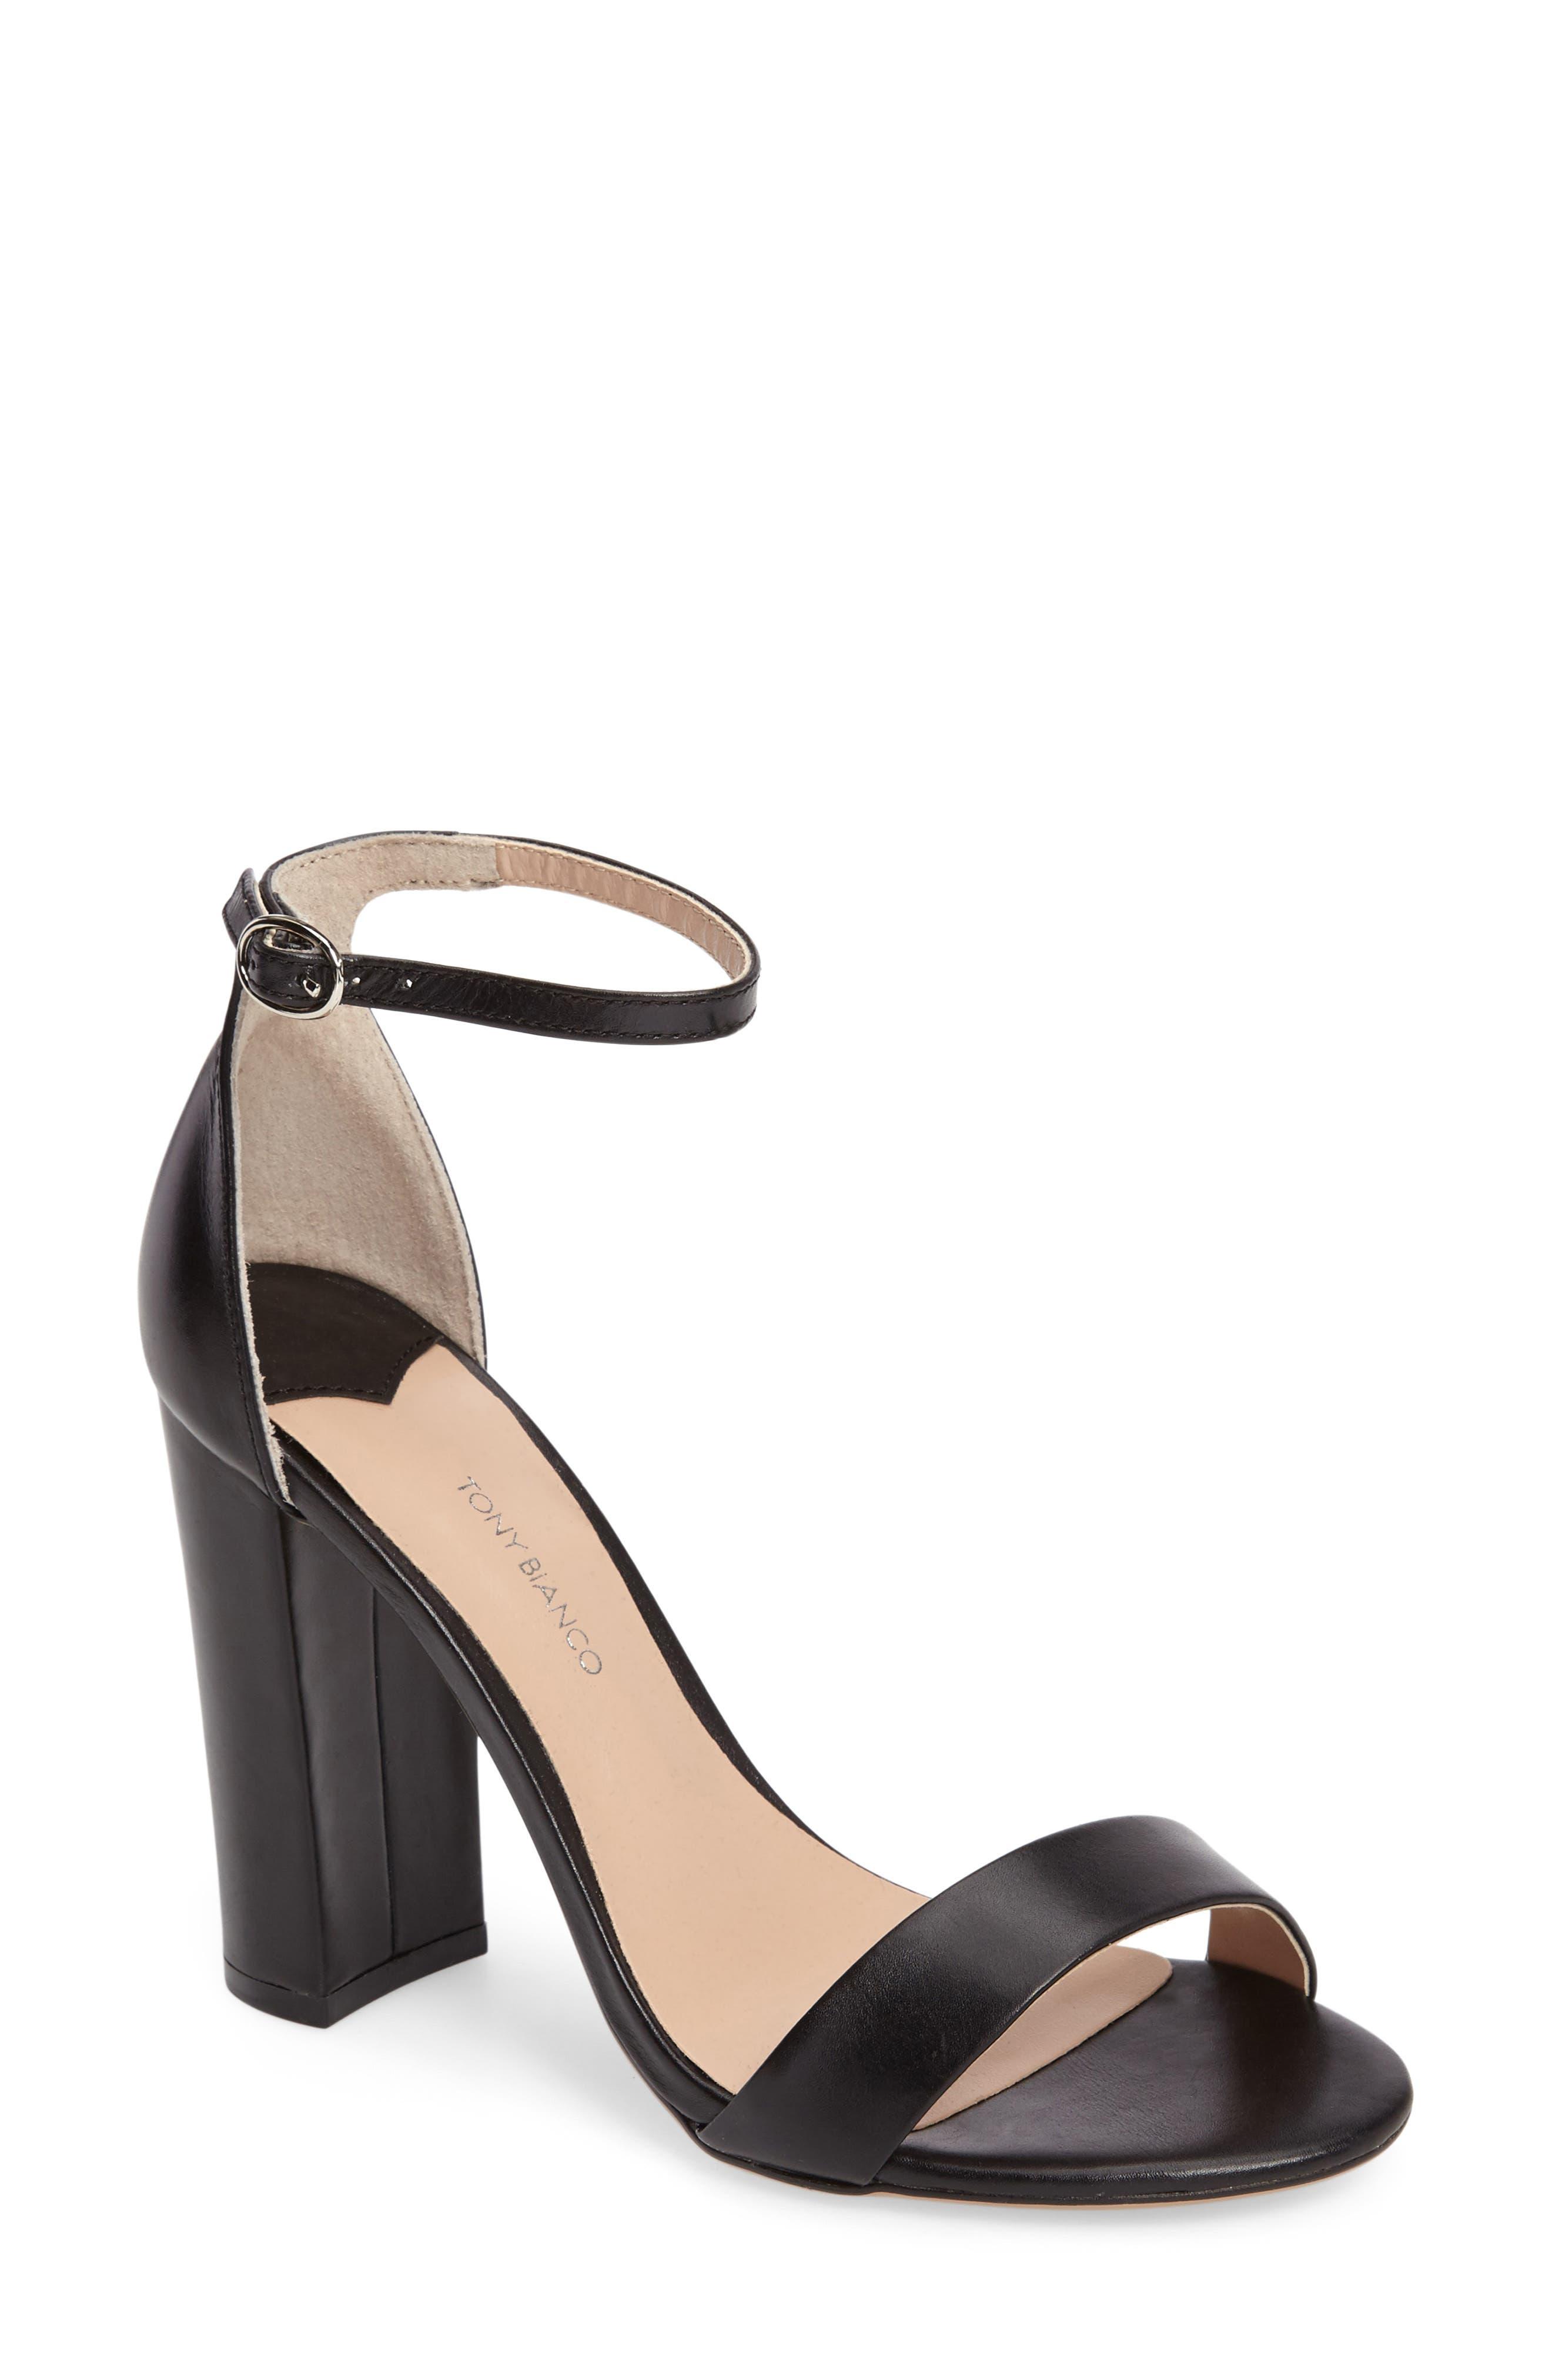 Alternate Image 1 Selected - Tony Bianco Kokomo Strappy Sandal (Women)